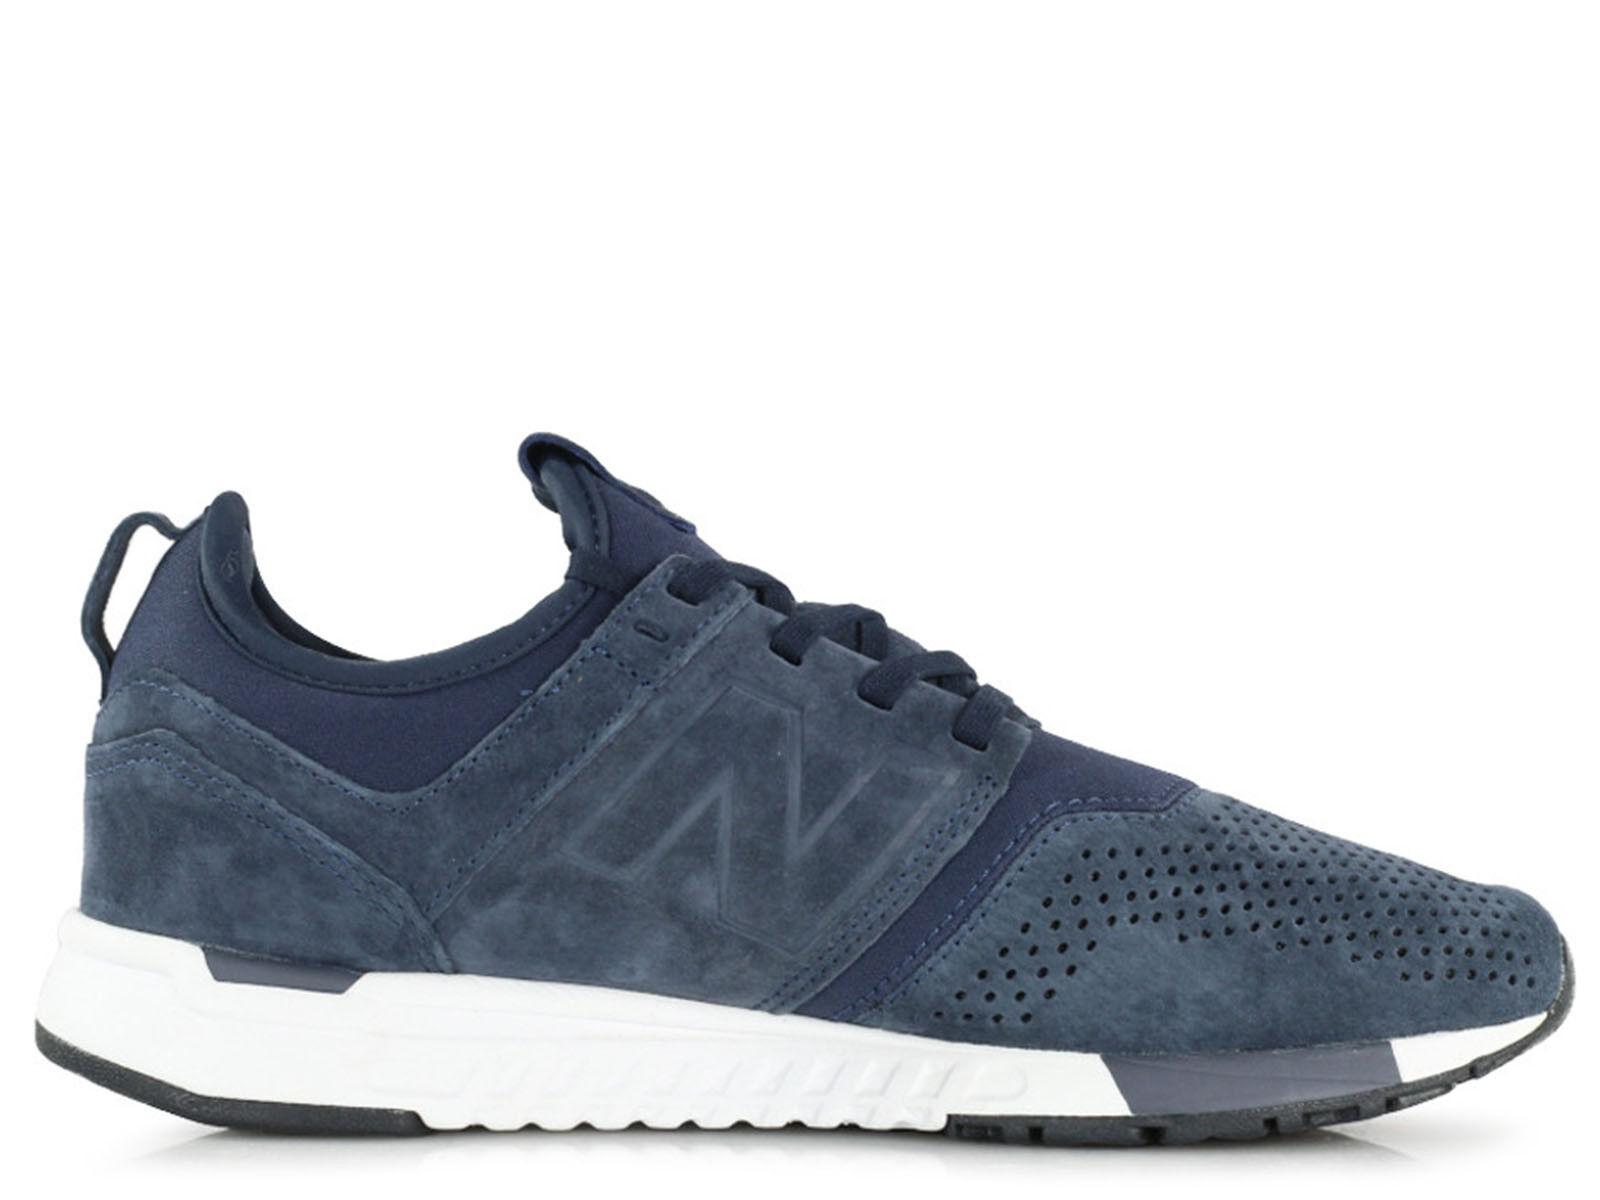 Men's Brand New New Balance Lifestyle Mode De Vie Athletic Sneakers [MRL247LN]